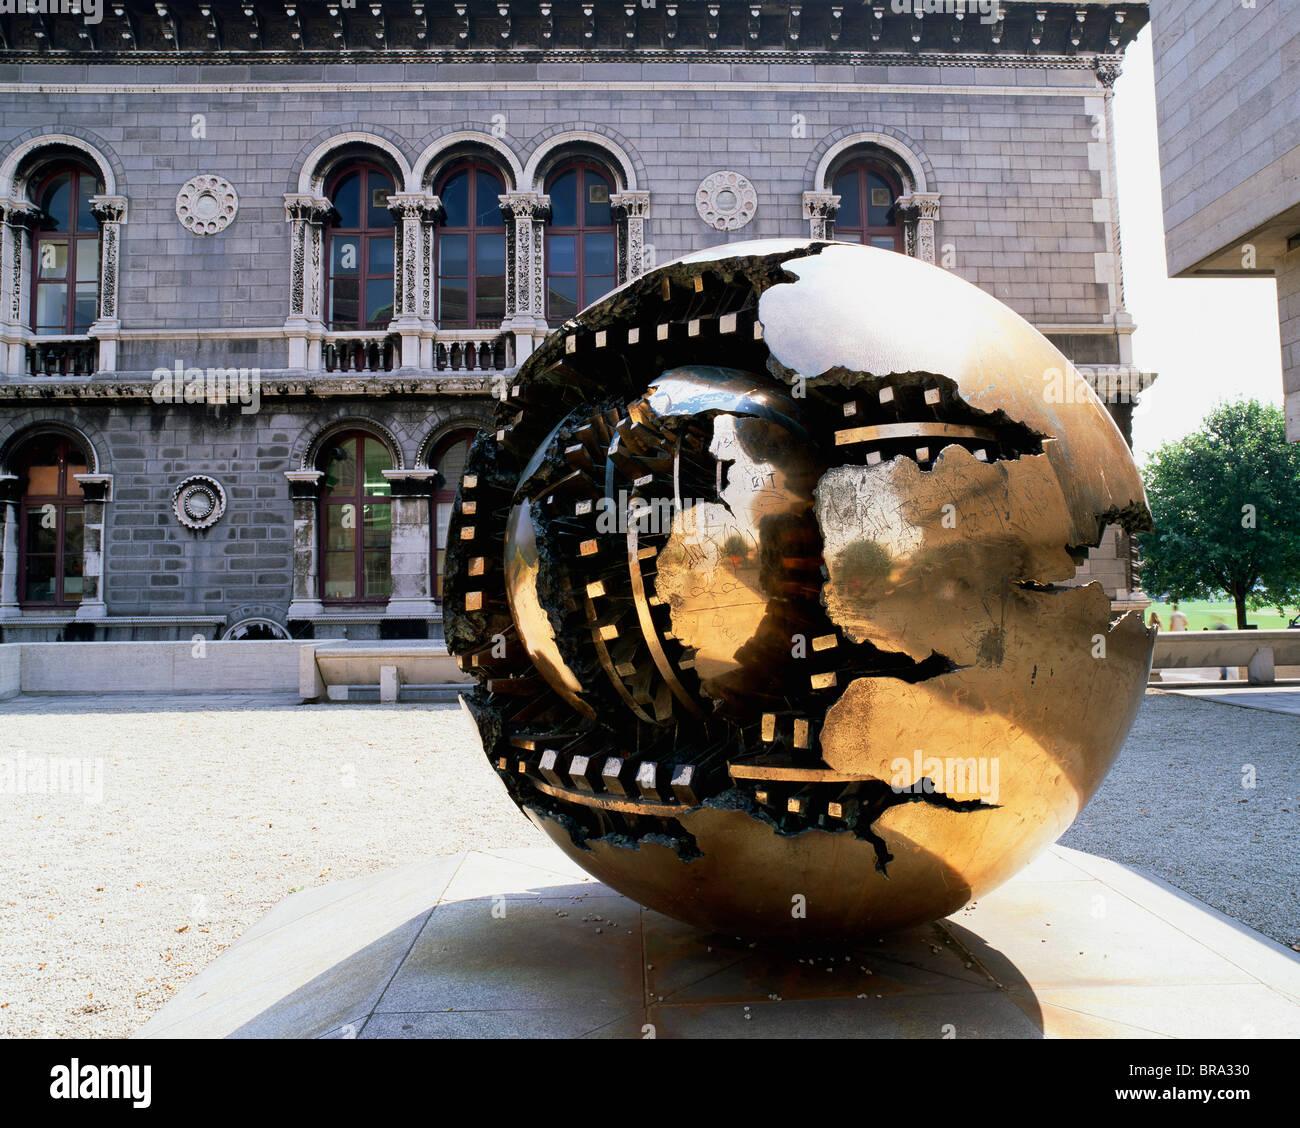 'Sphere Within Sphere' Arnaldo Pomodoro Sculpture, Trinity College, Dublin - Stock Image